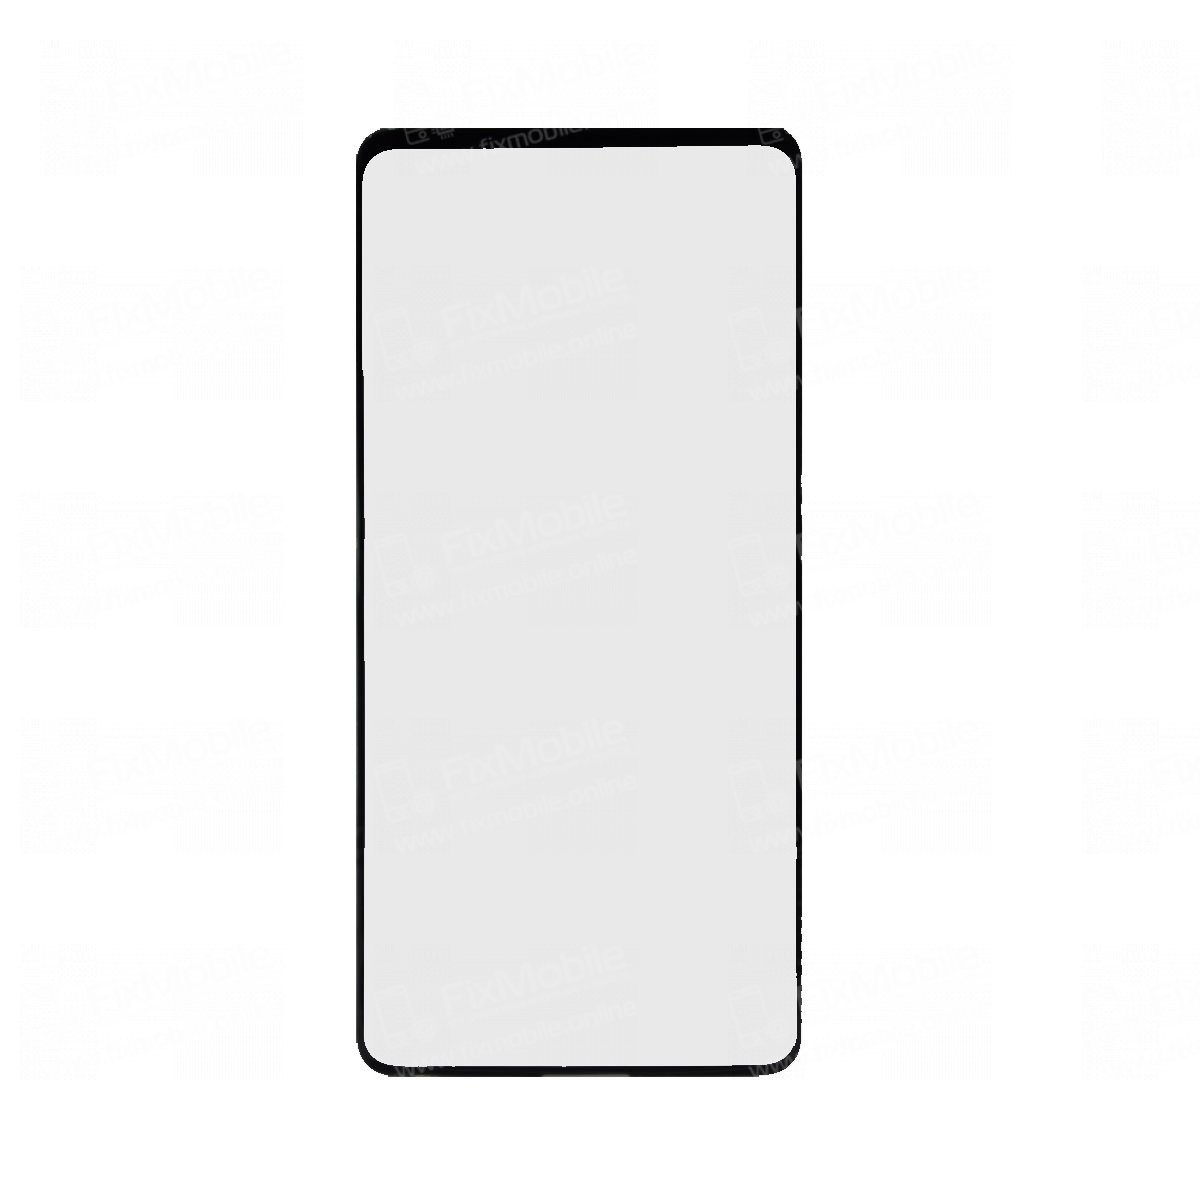 Стекло для Samsung Galaxy M31s (M317F) (черное)